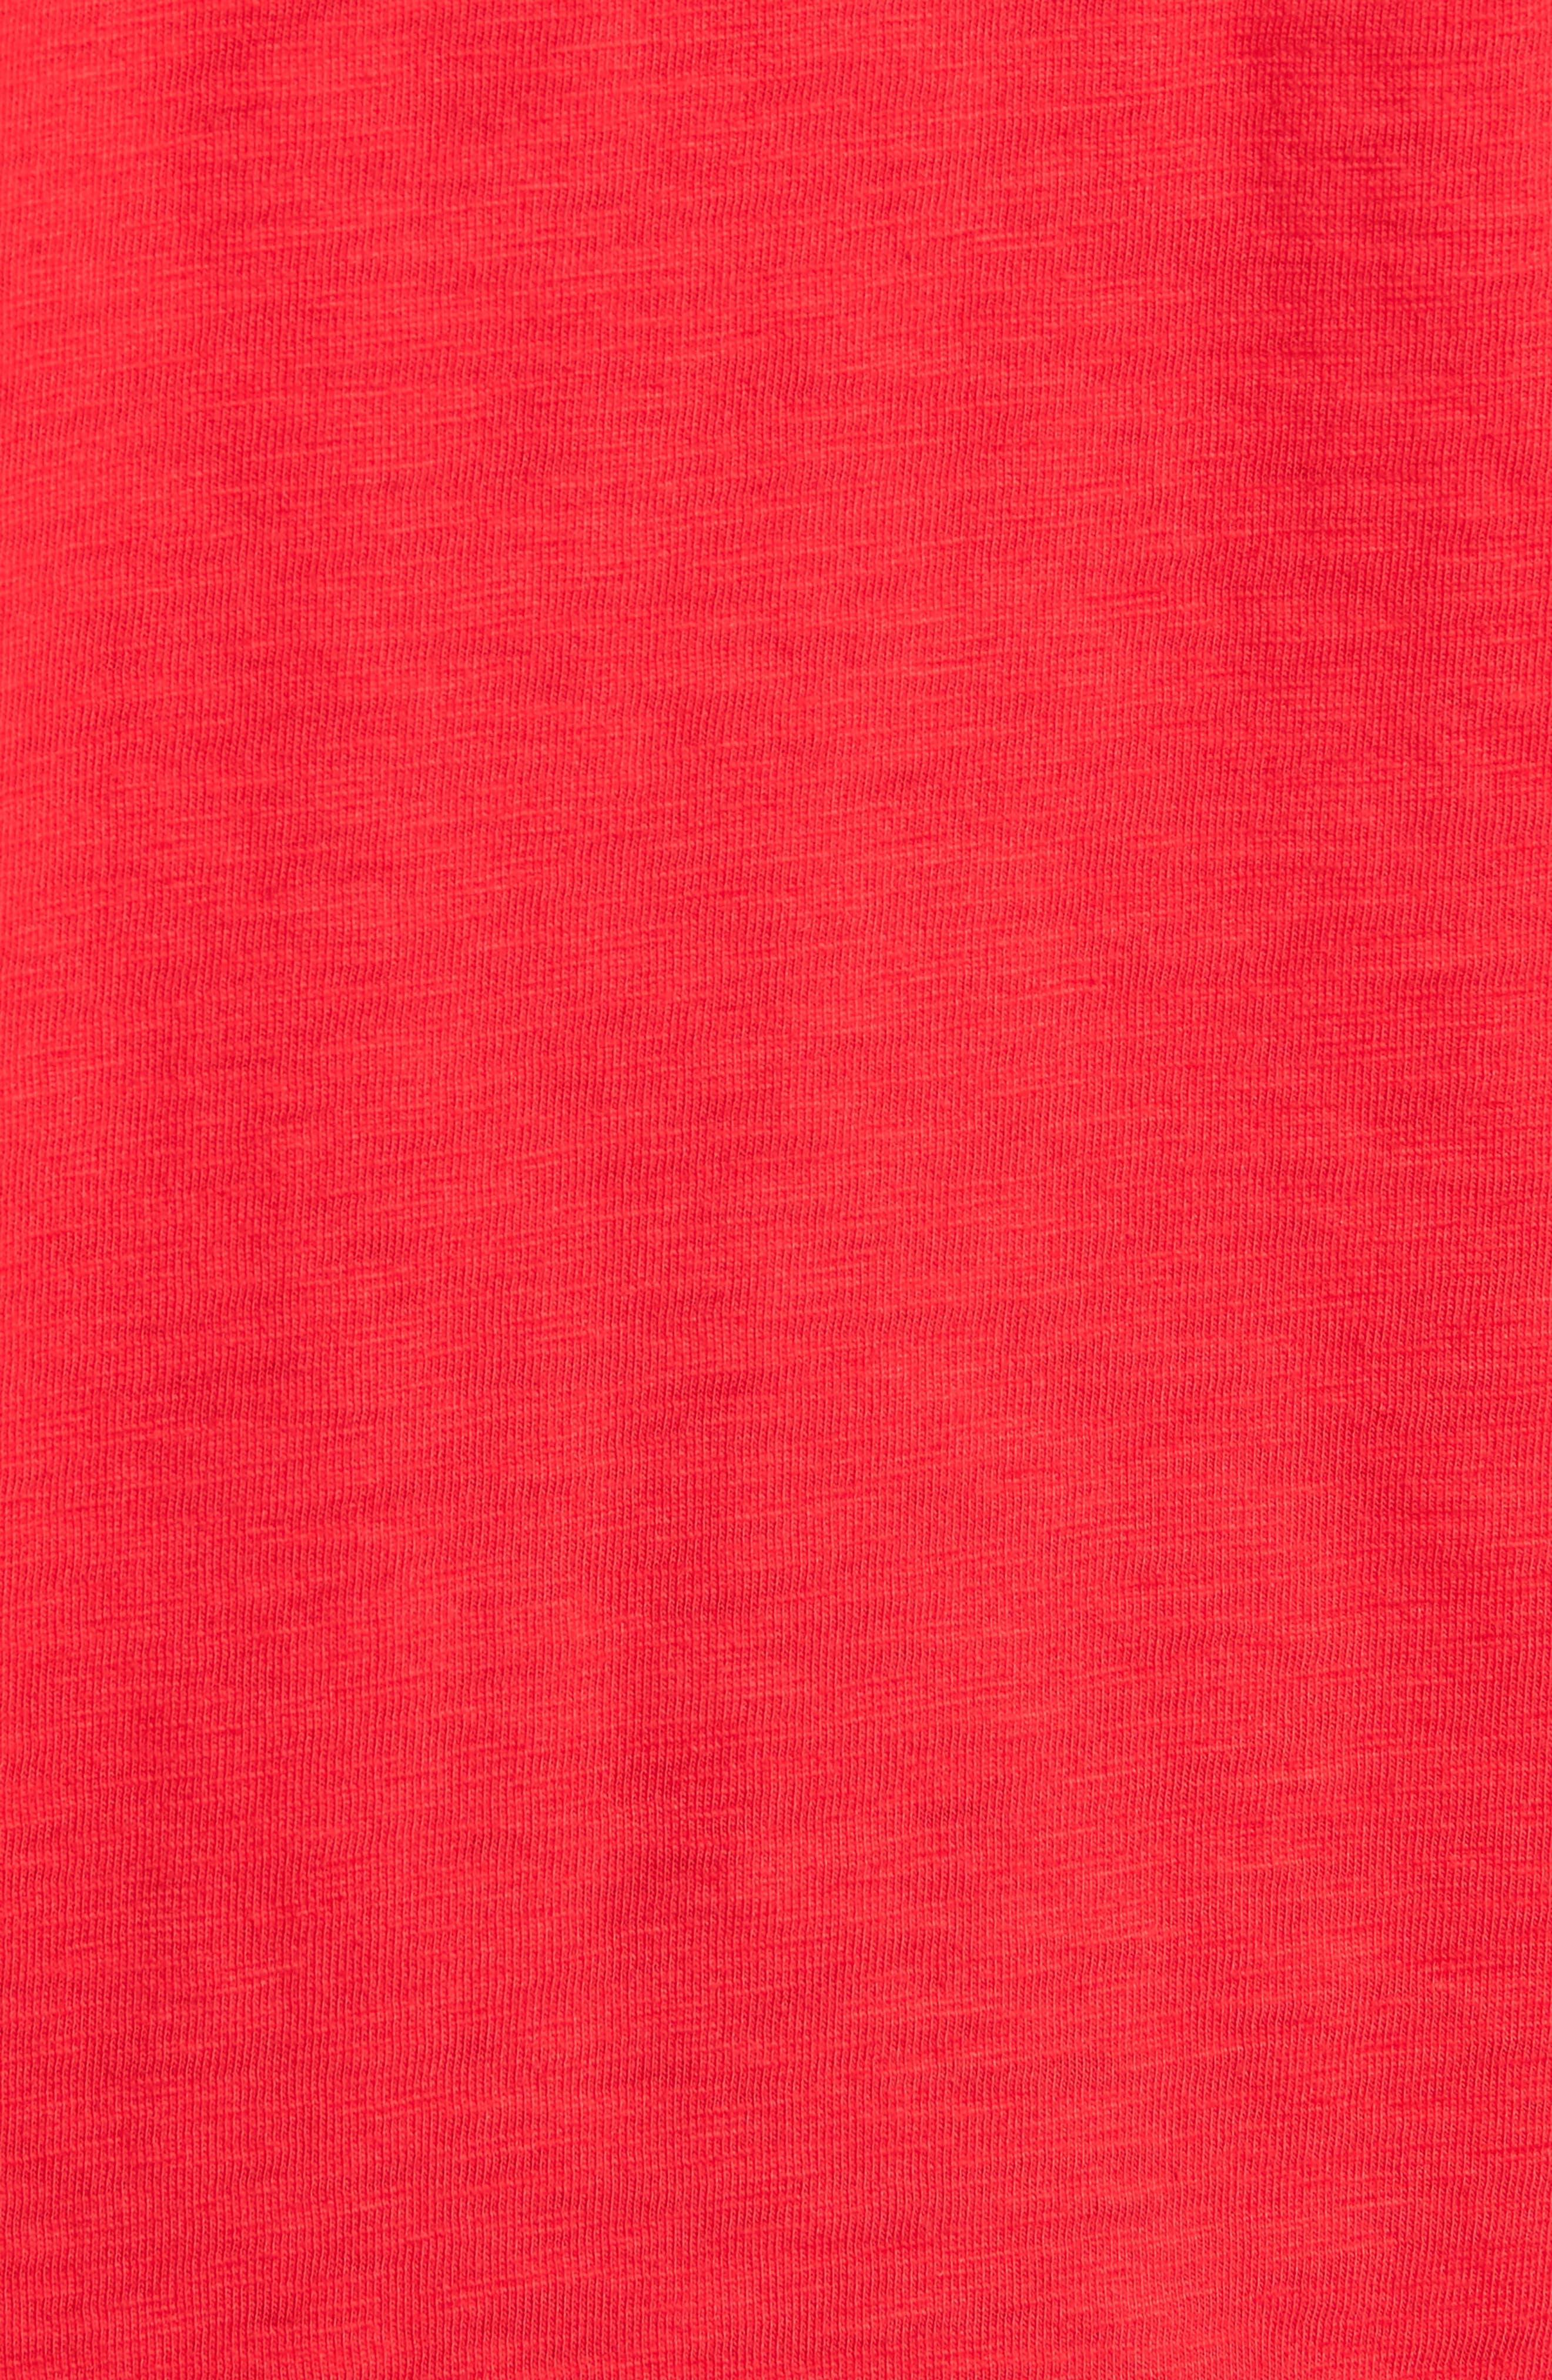 Alternate Image 5  - Southern Tide Montford Slub Pocket T-Shirt